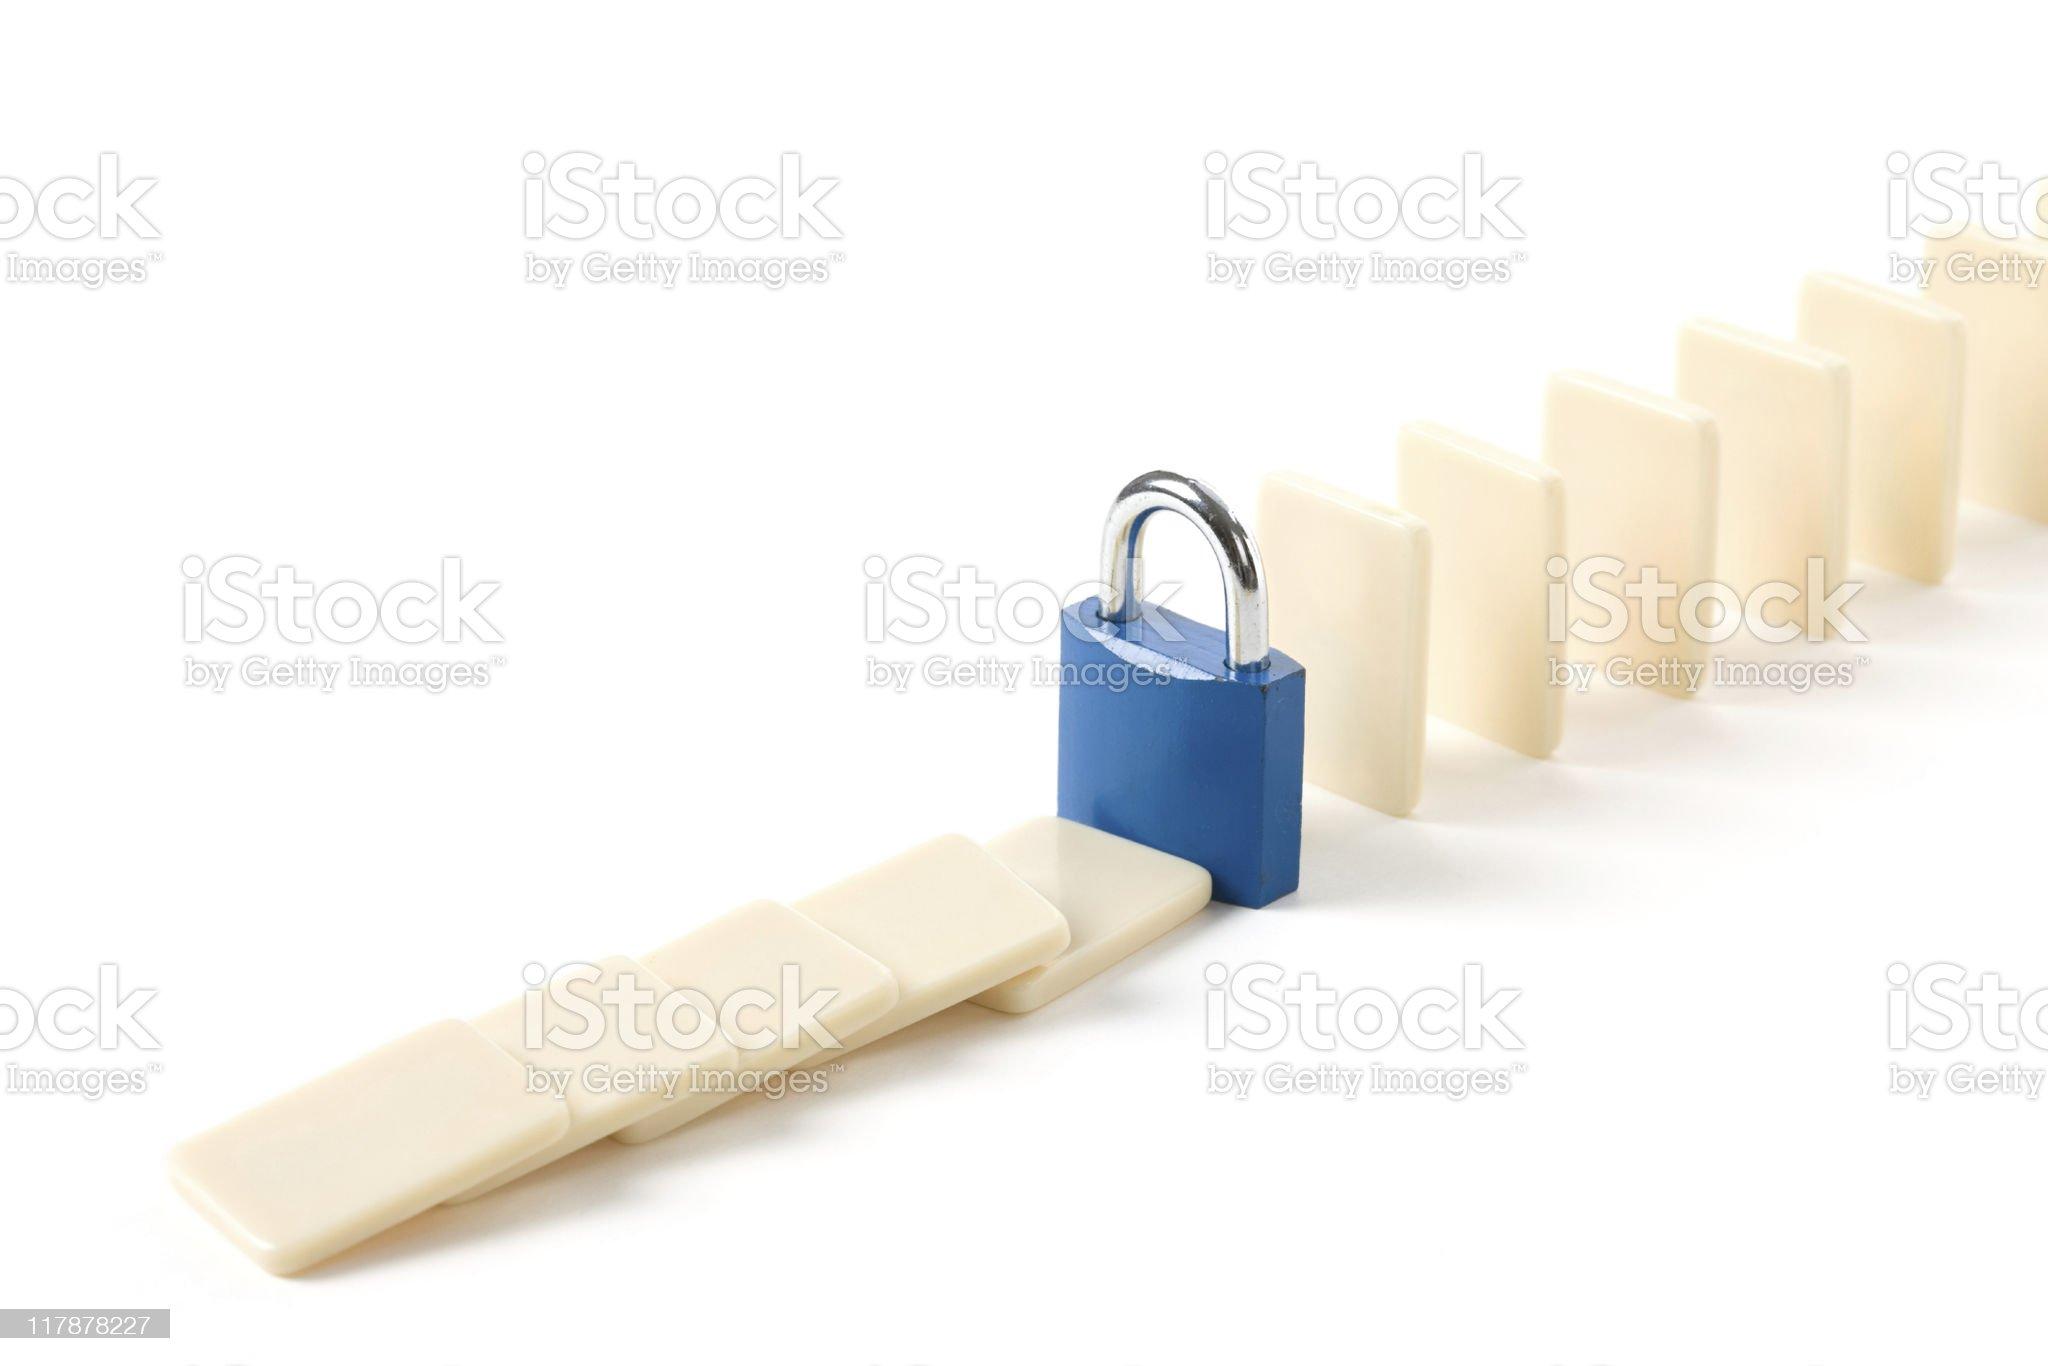 Domino and Lock royalty-free stock photo